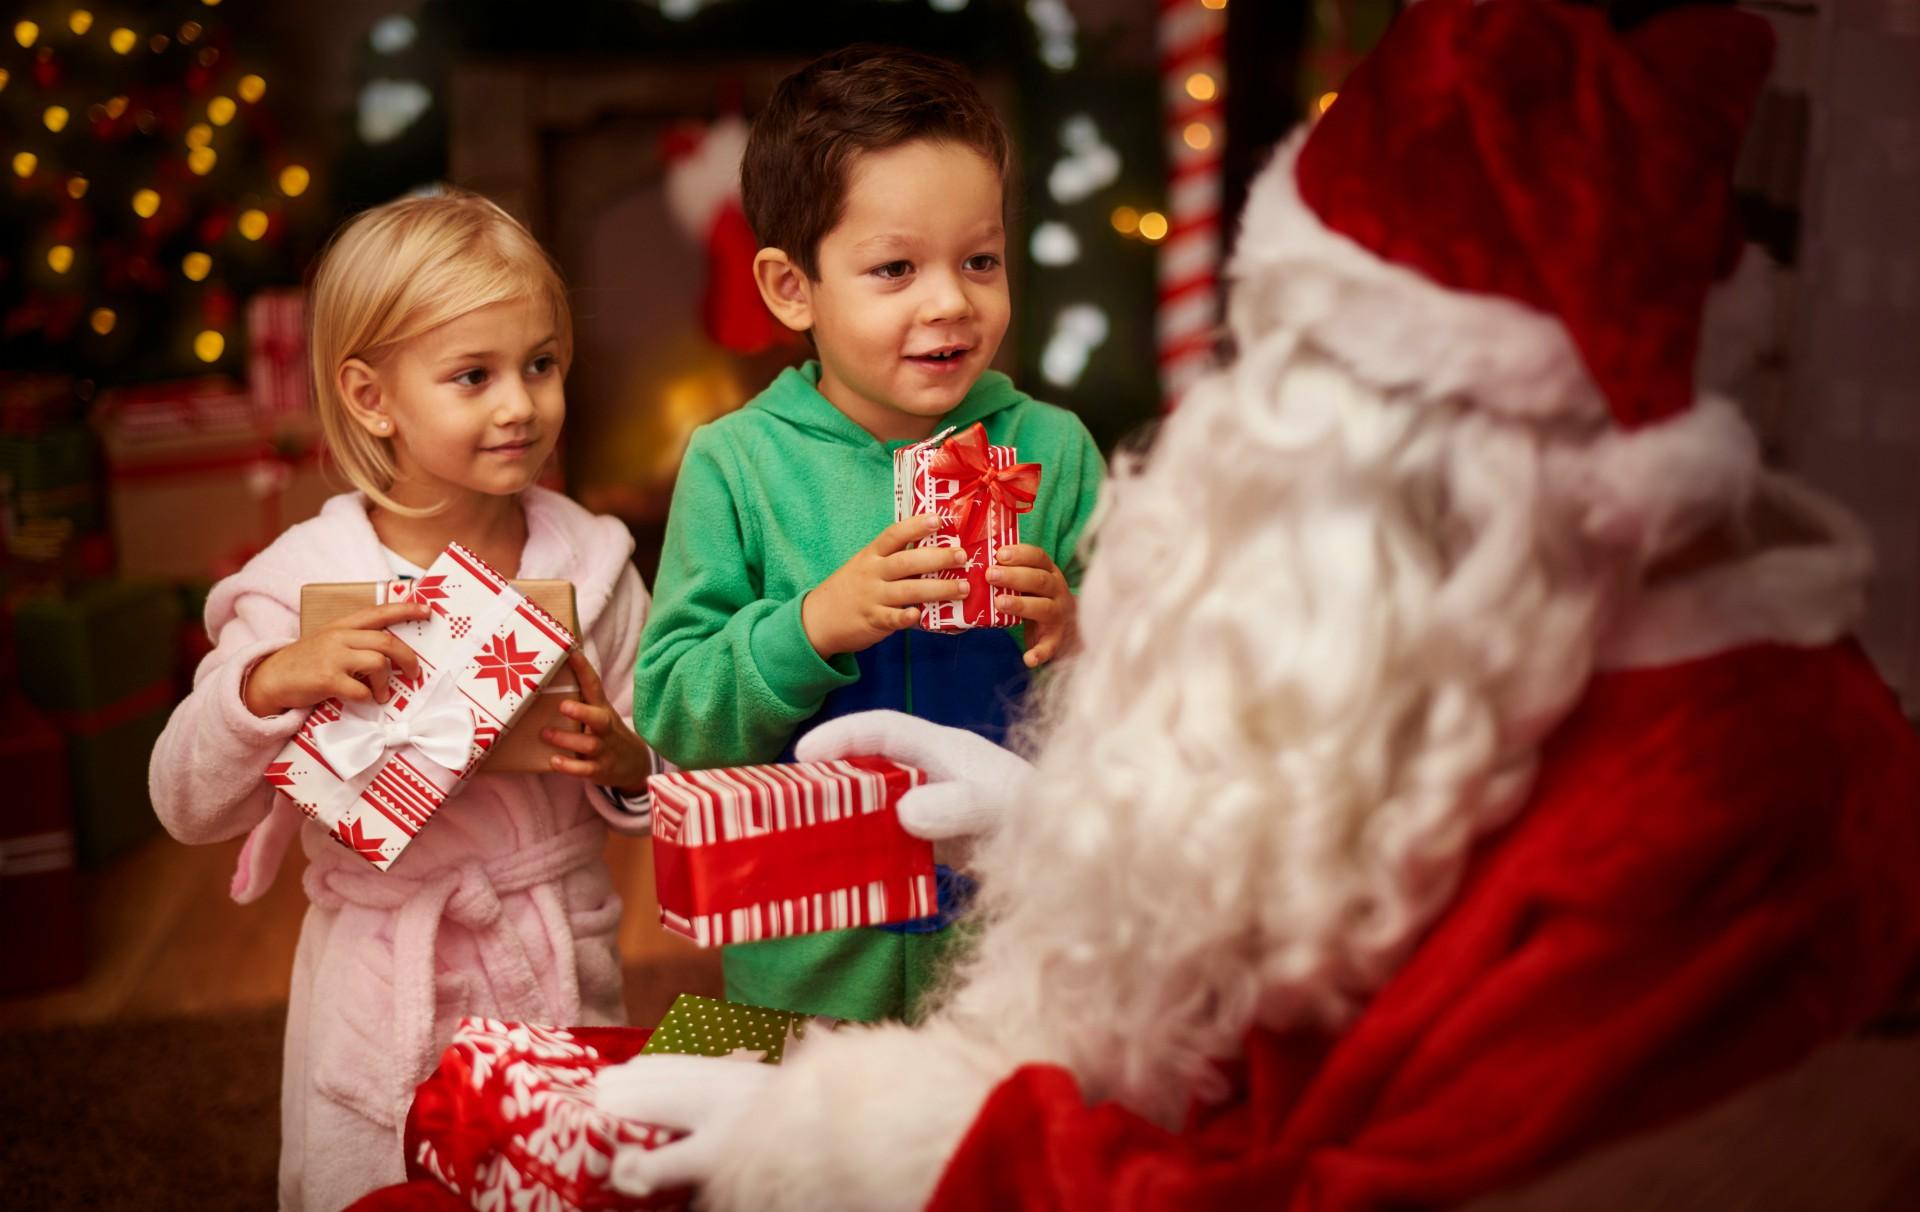 Is Santa real? How to make the kids believe in Santa